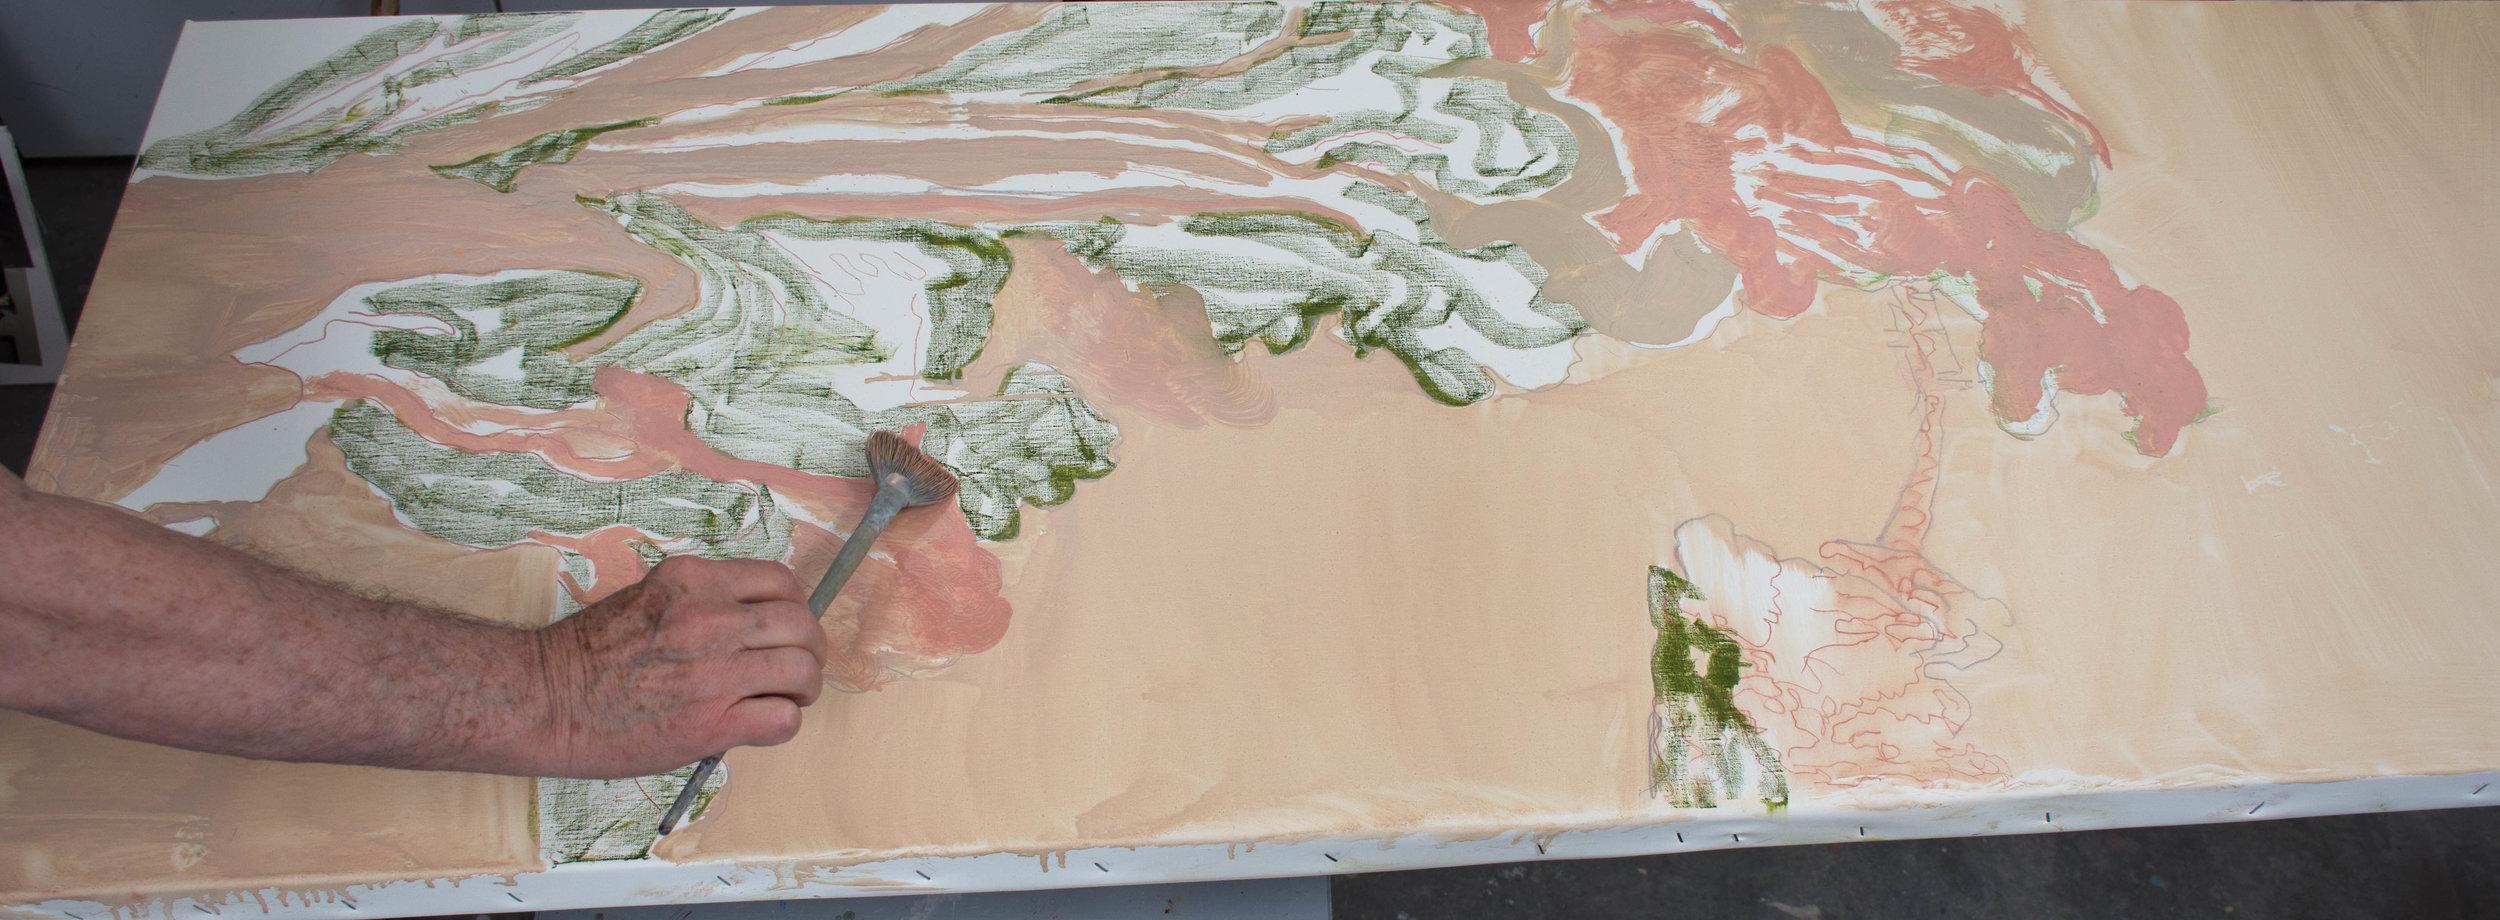 7-18-19 PT paints Landscape with Pink Trees-3.jpg